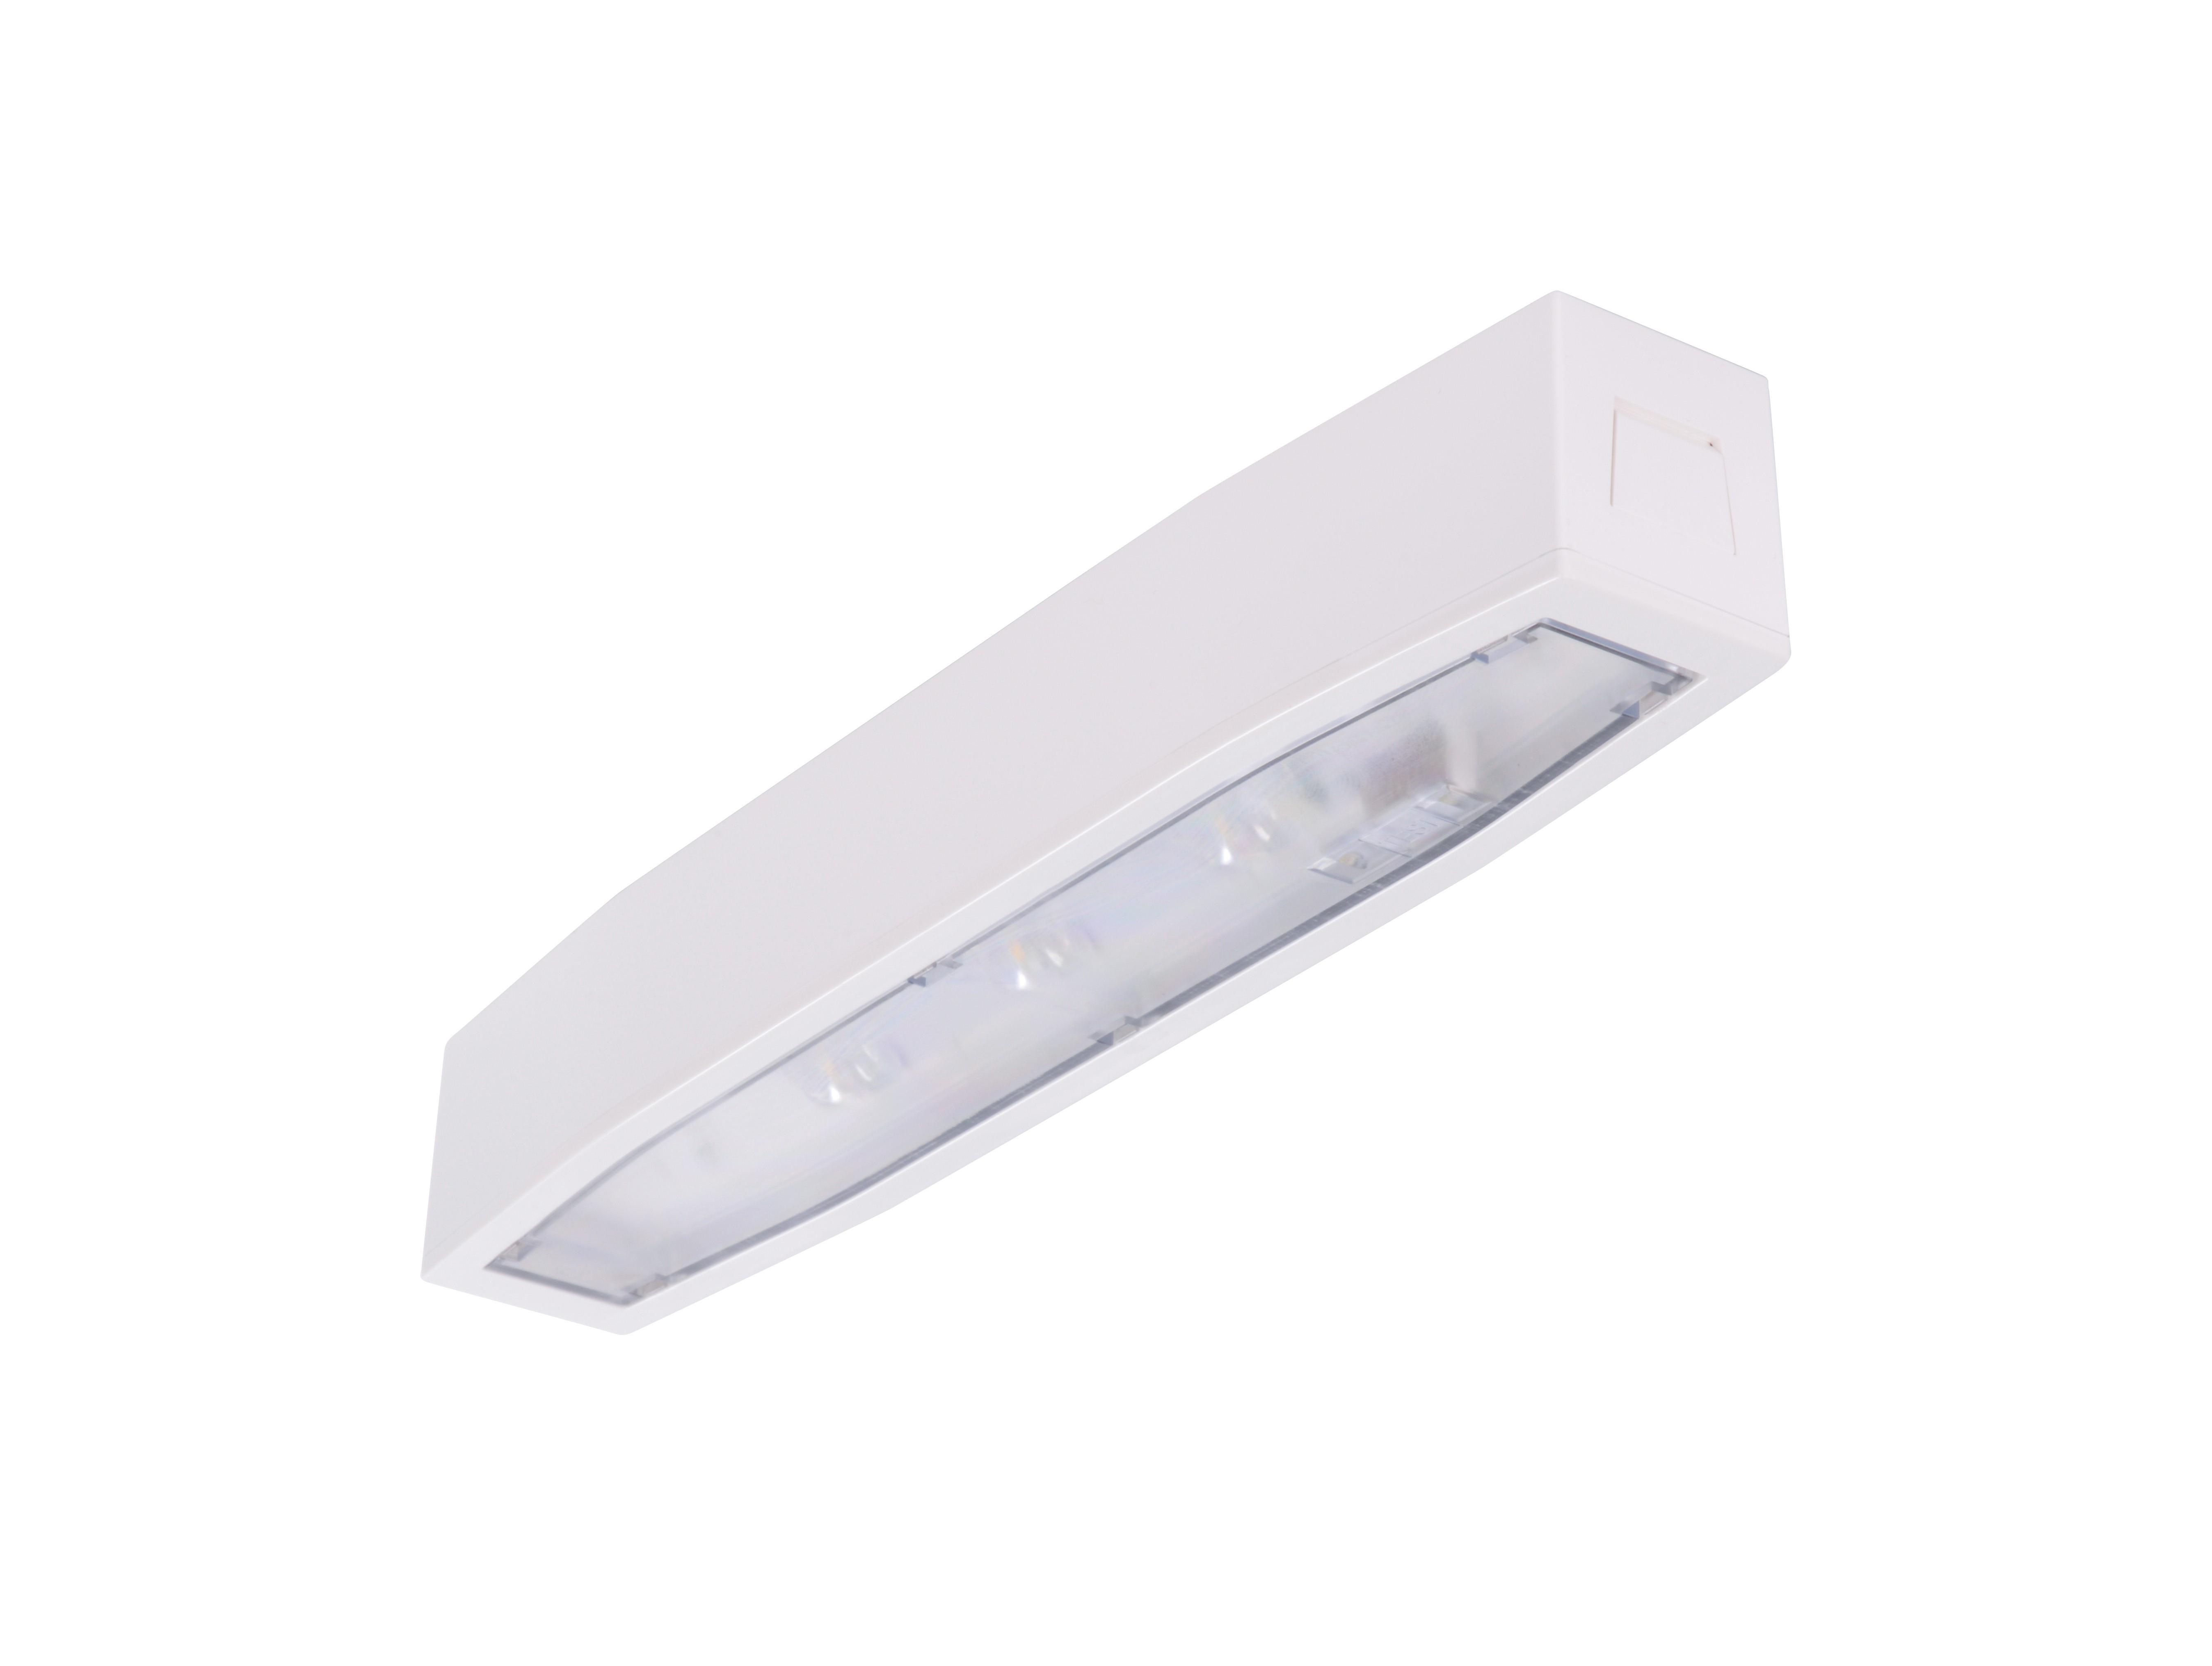 Lampa emergenta led Intelight 94521   3h mentinut test automat 0